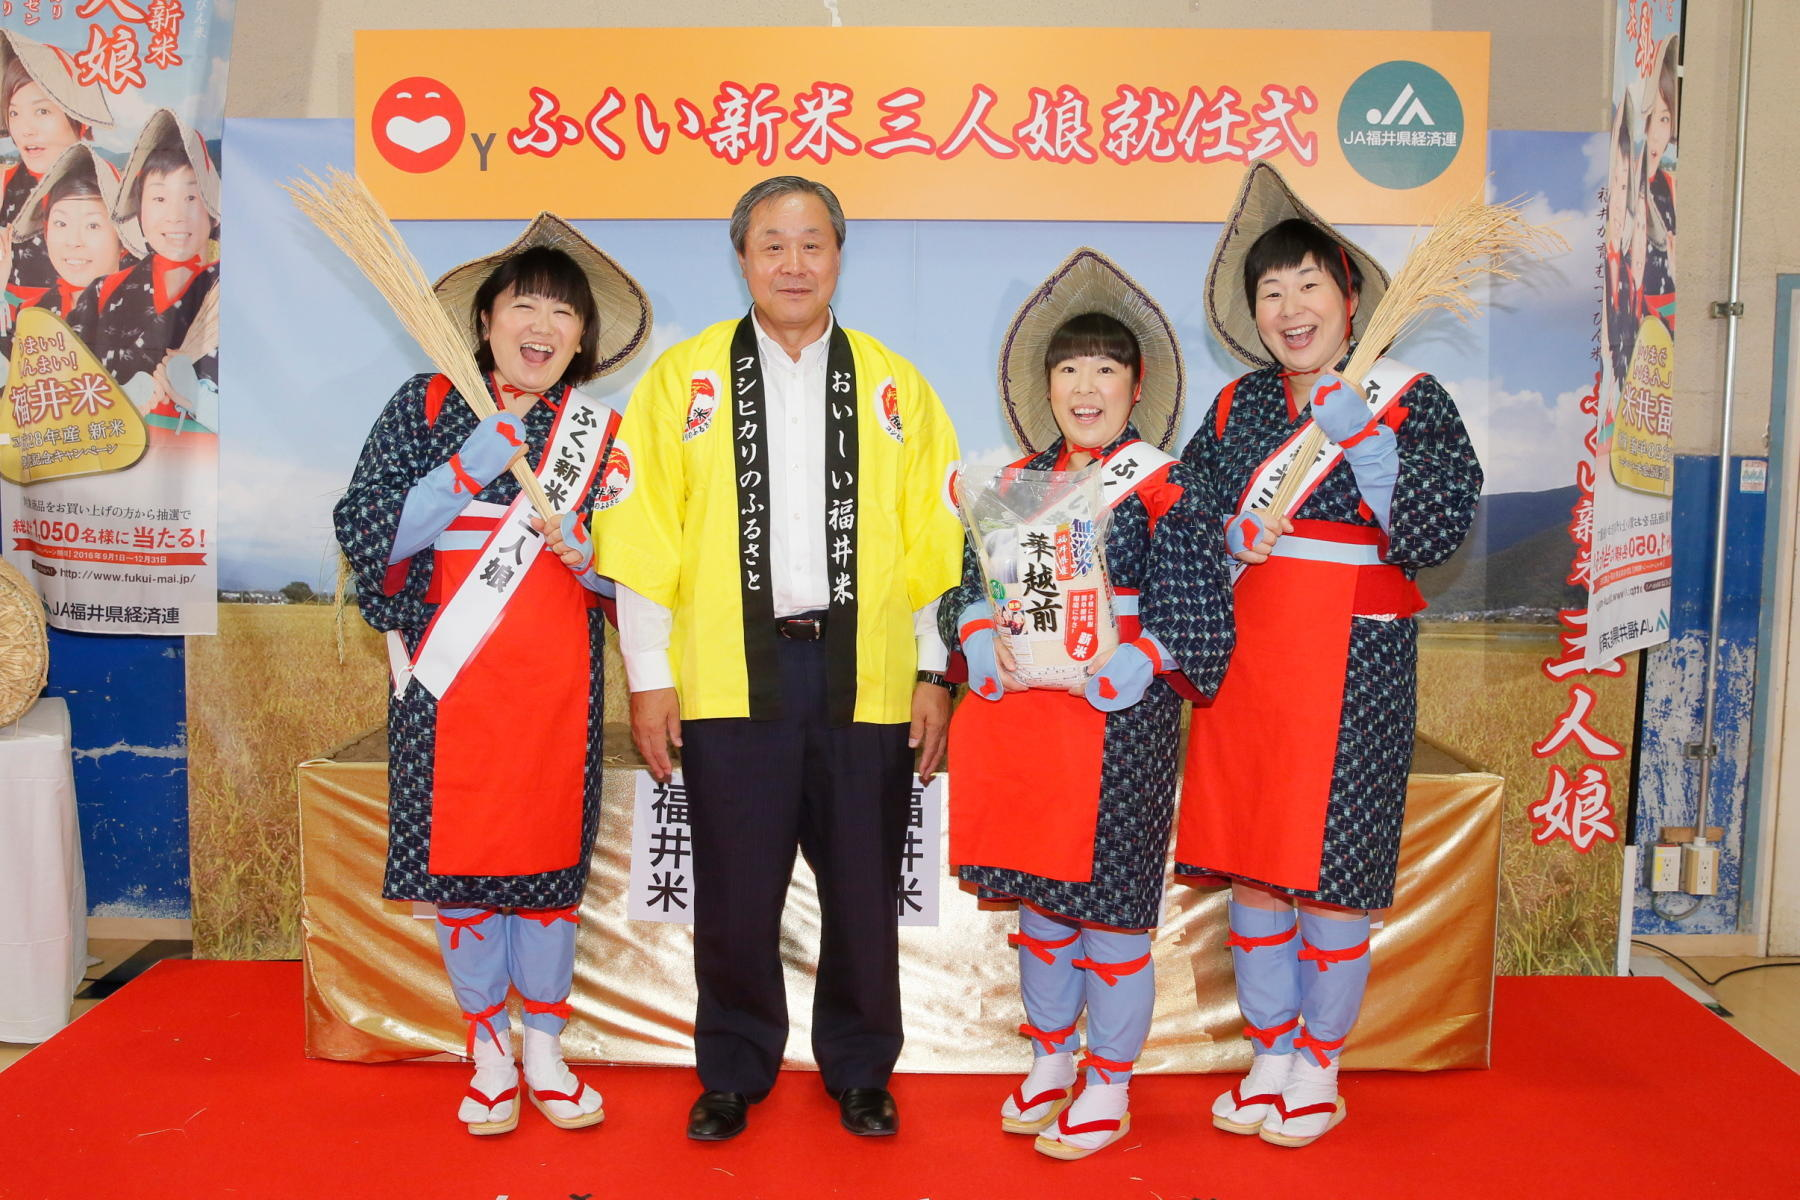 http://news.yoshimoto.co.jp/20160831144142-d7f0dcca65a8afb57cab4d5c308af7cd58838cde.jpg